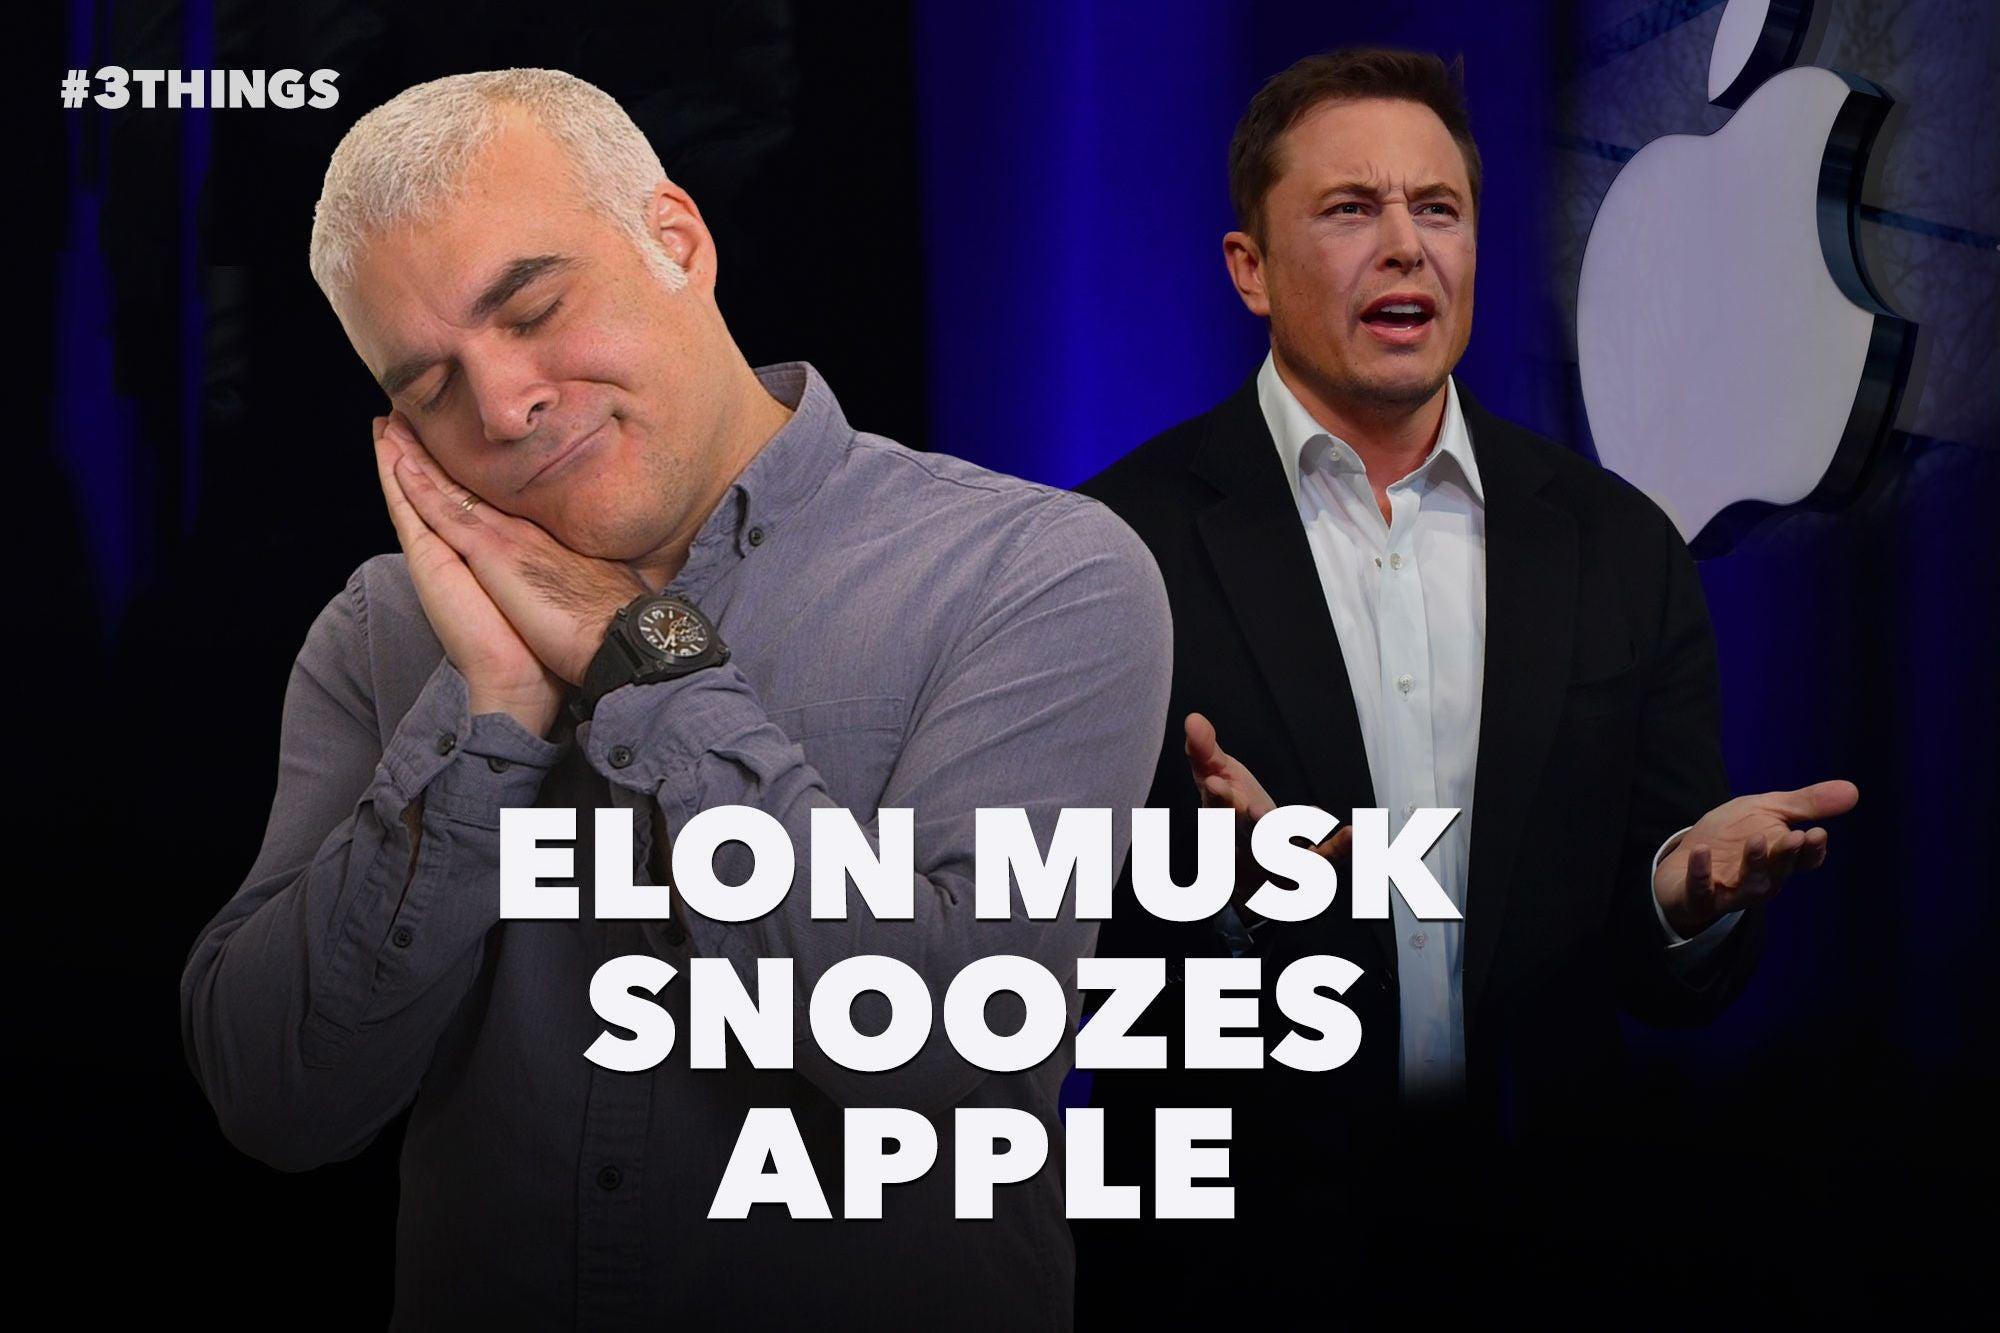 entrepreneur.com - Dan Bova - (60-Second Video) Elon Musk, Warren Buffett and Midterm Election Mega Billions!